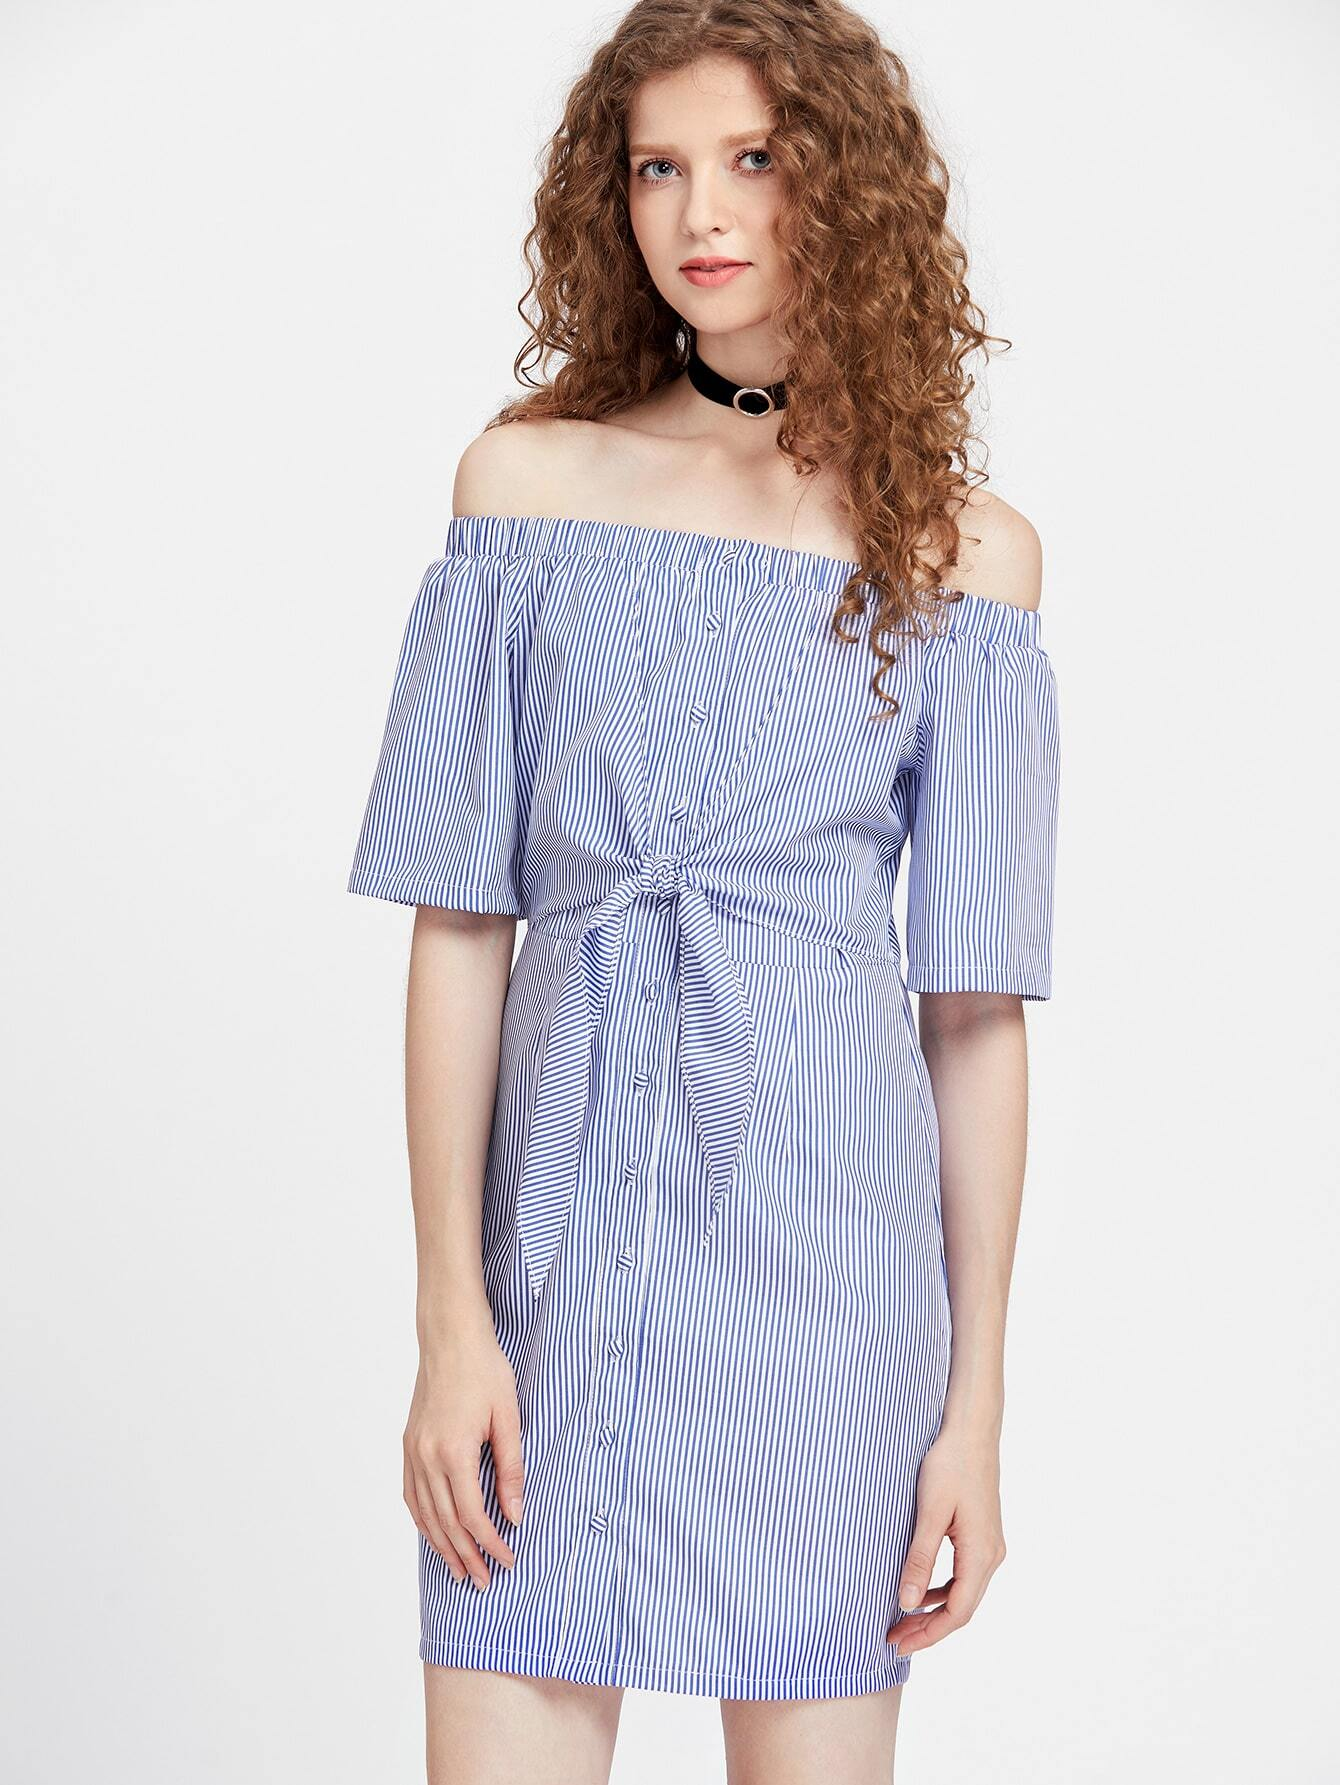 Bardot pinstripe knot front button dress shein sheinside for The knot lookbook wedding dresses